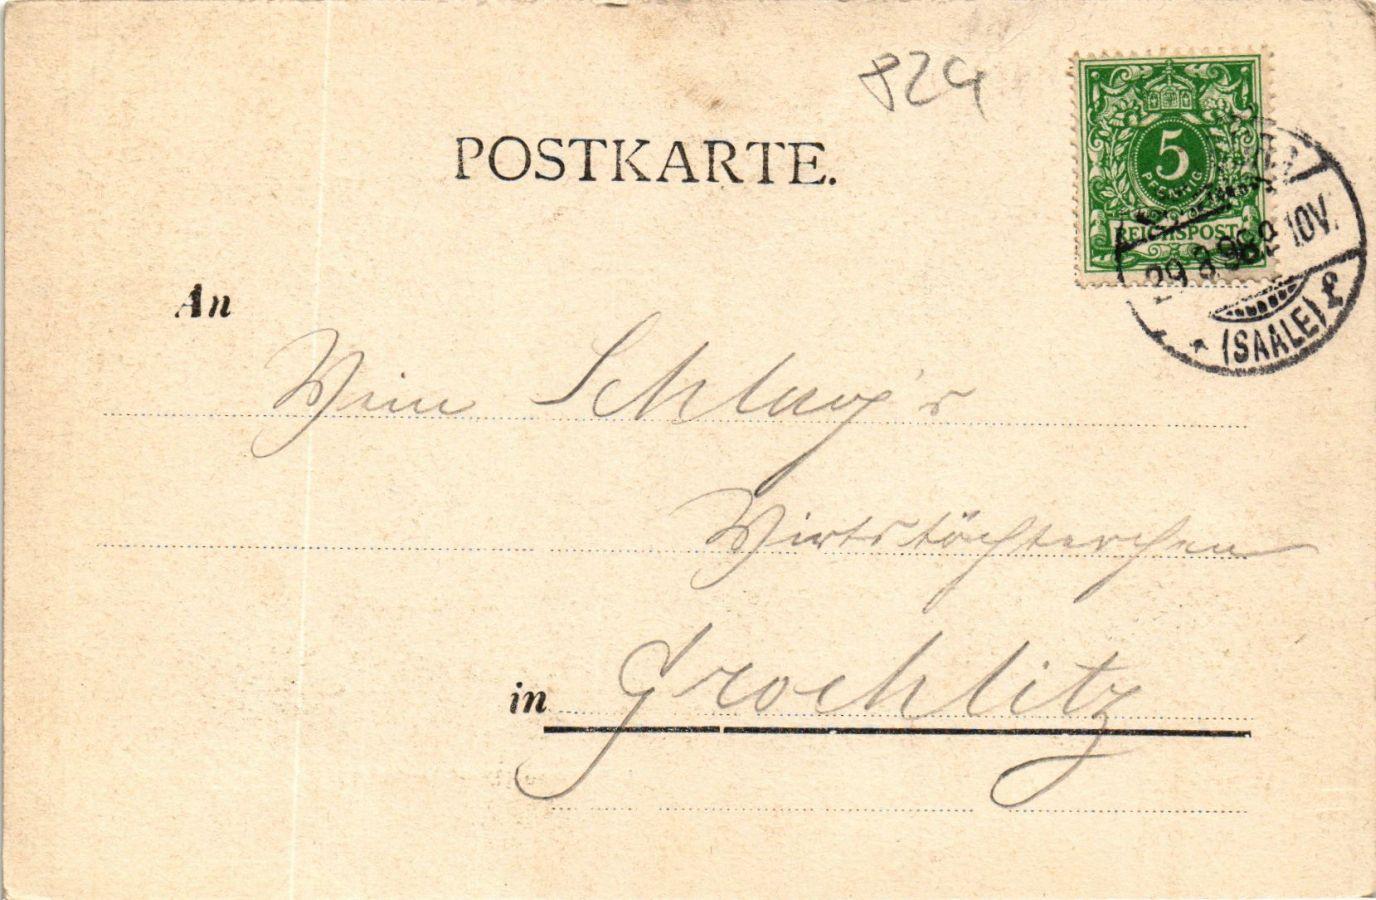 CPA-AK-Konigssee-Berchtesgaden-GERMANY-878875 miniature 2